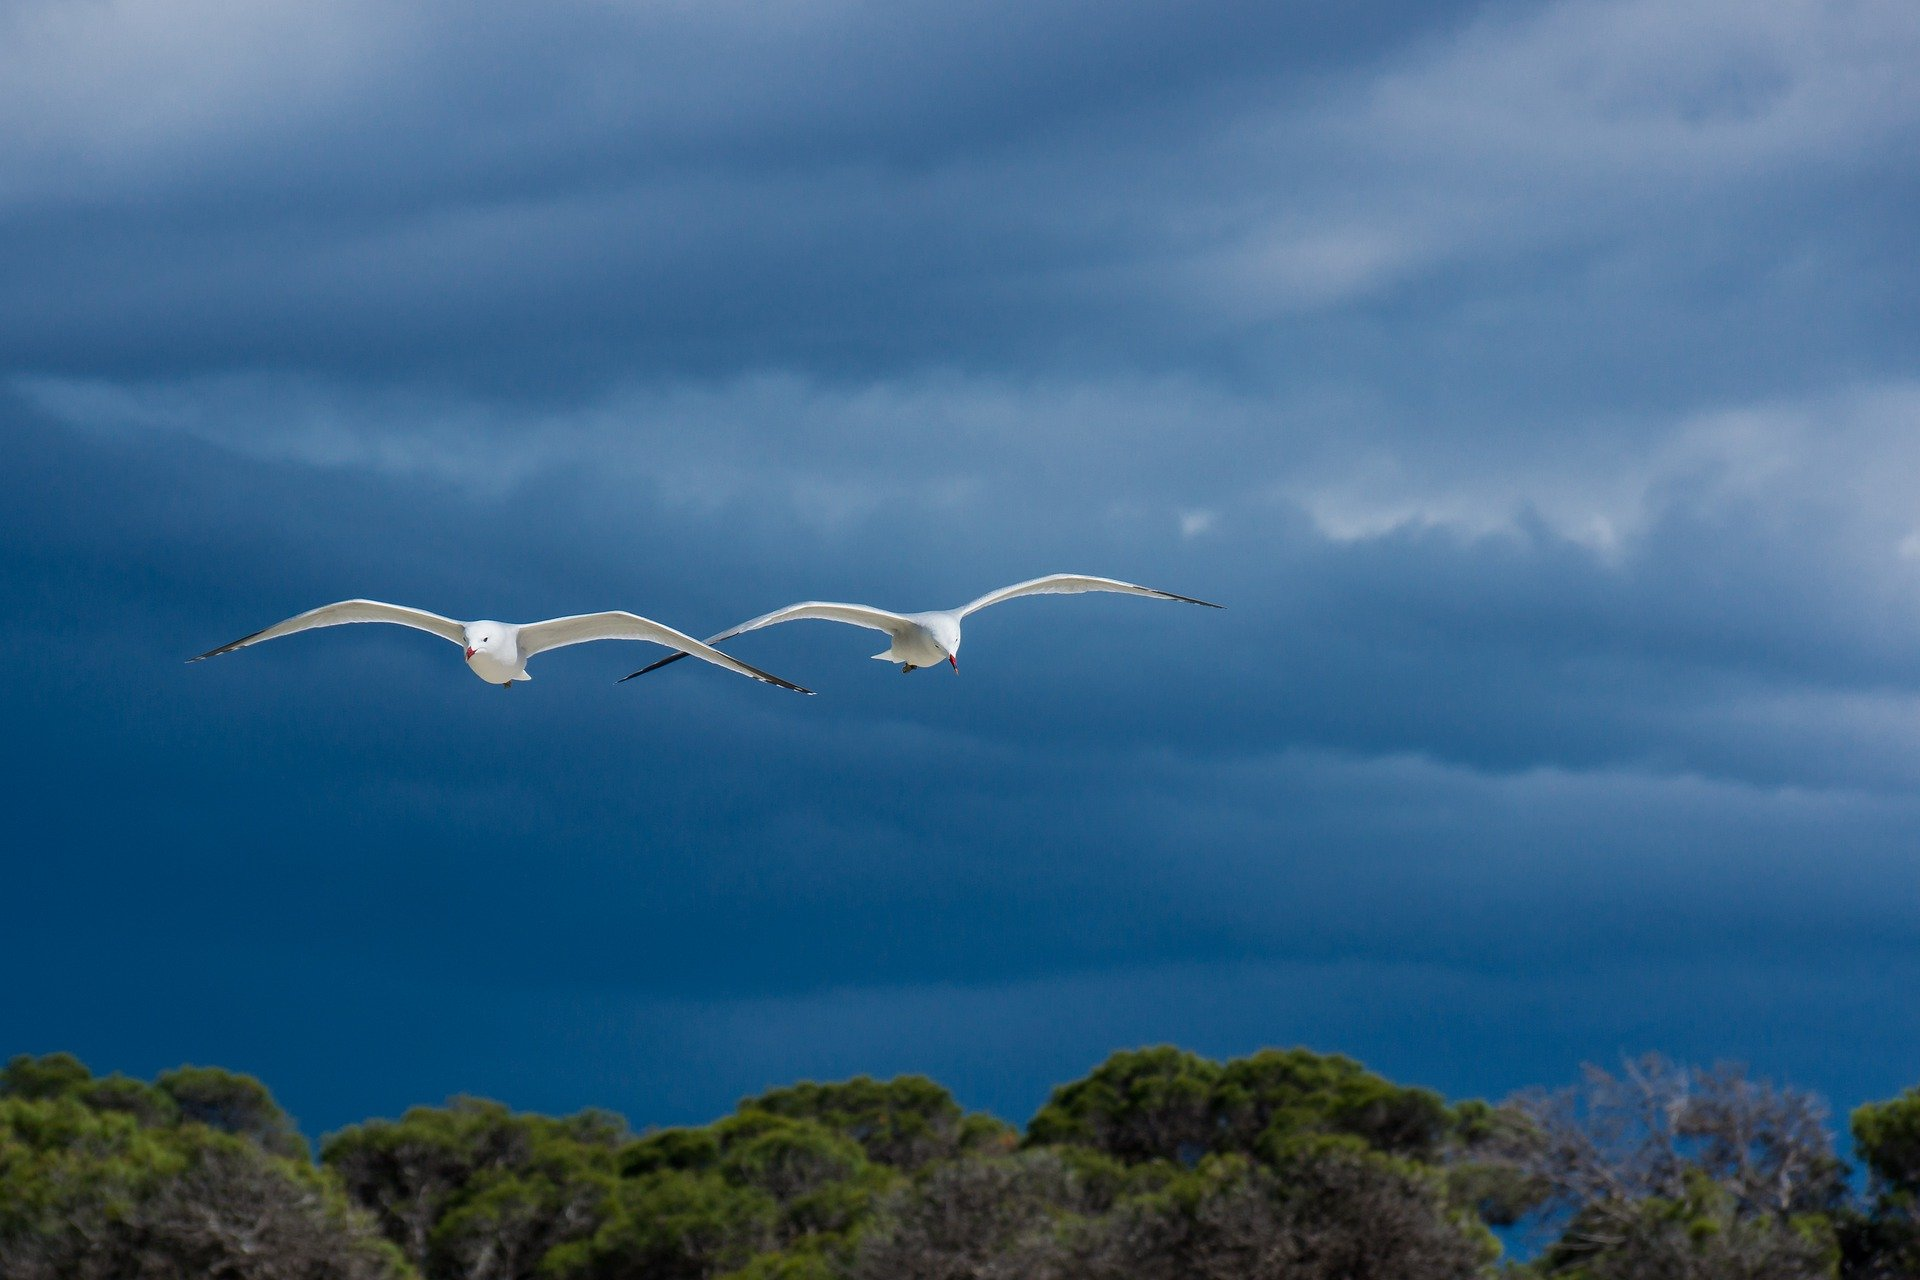 seagulls-6309501_1920.jpg